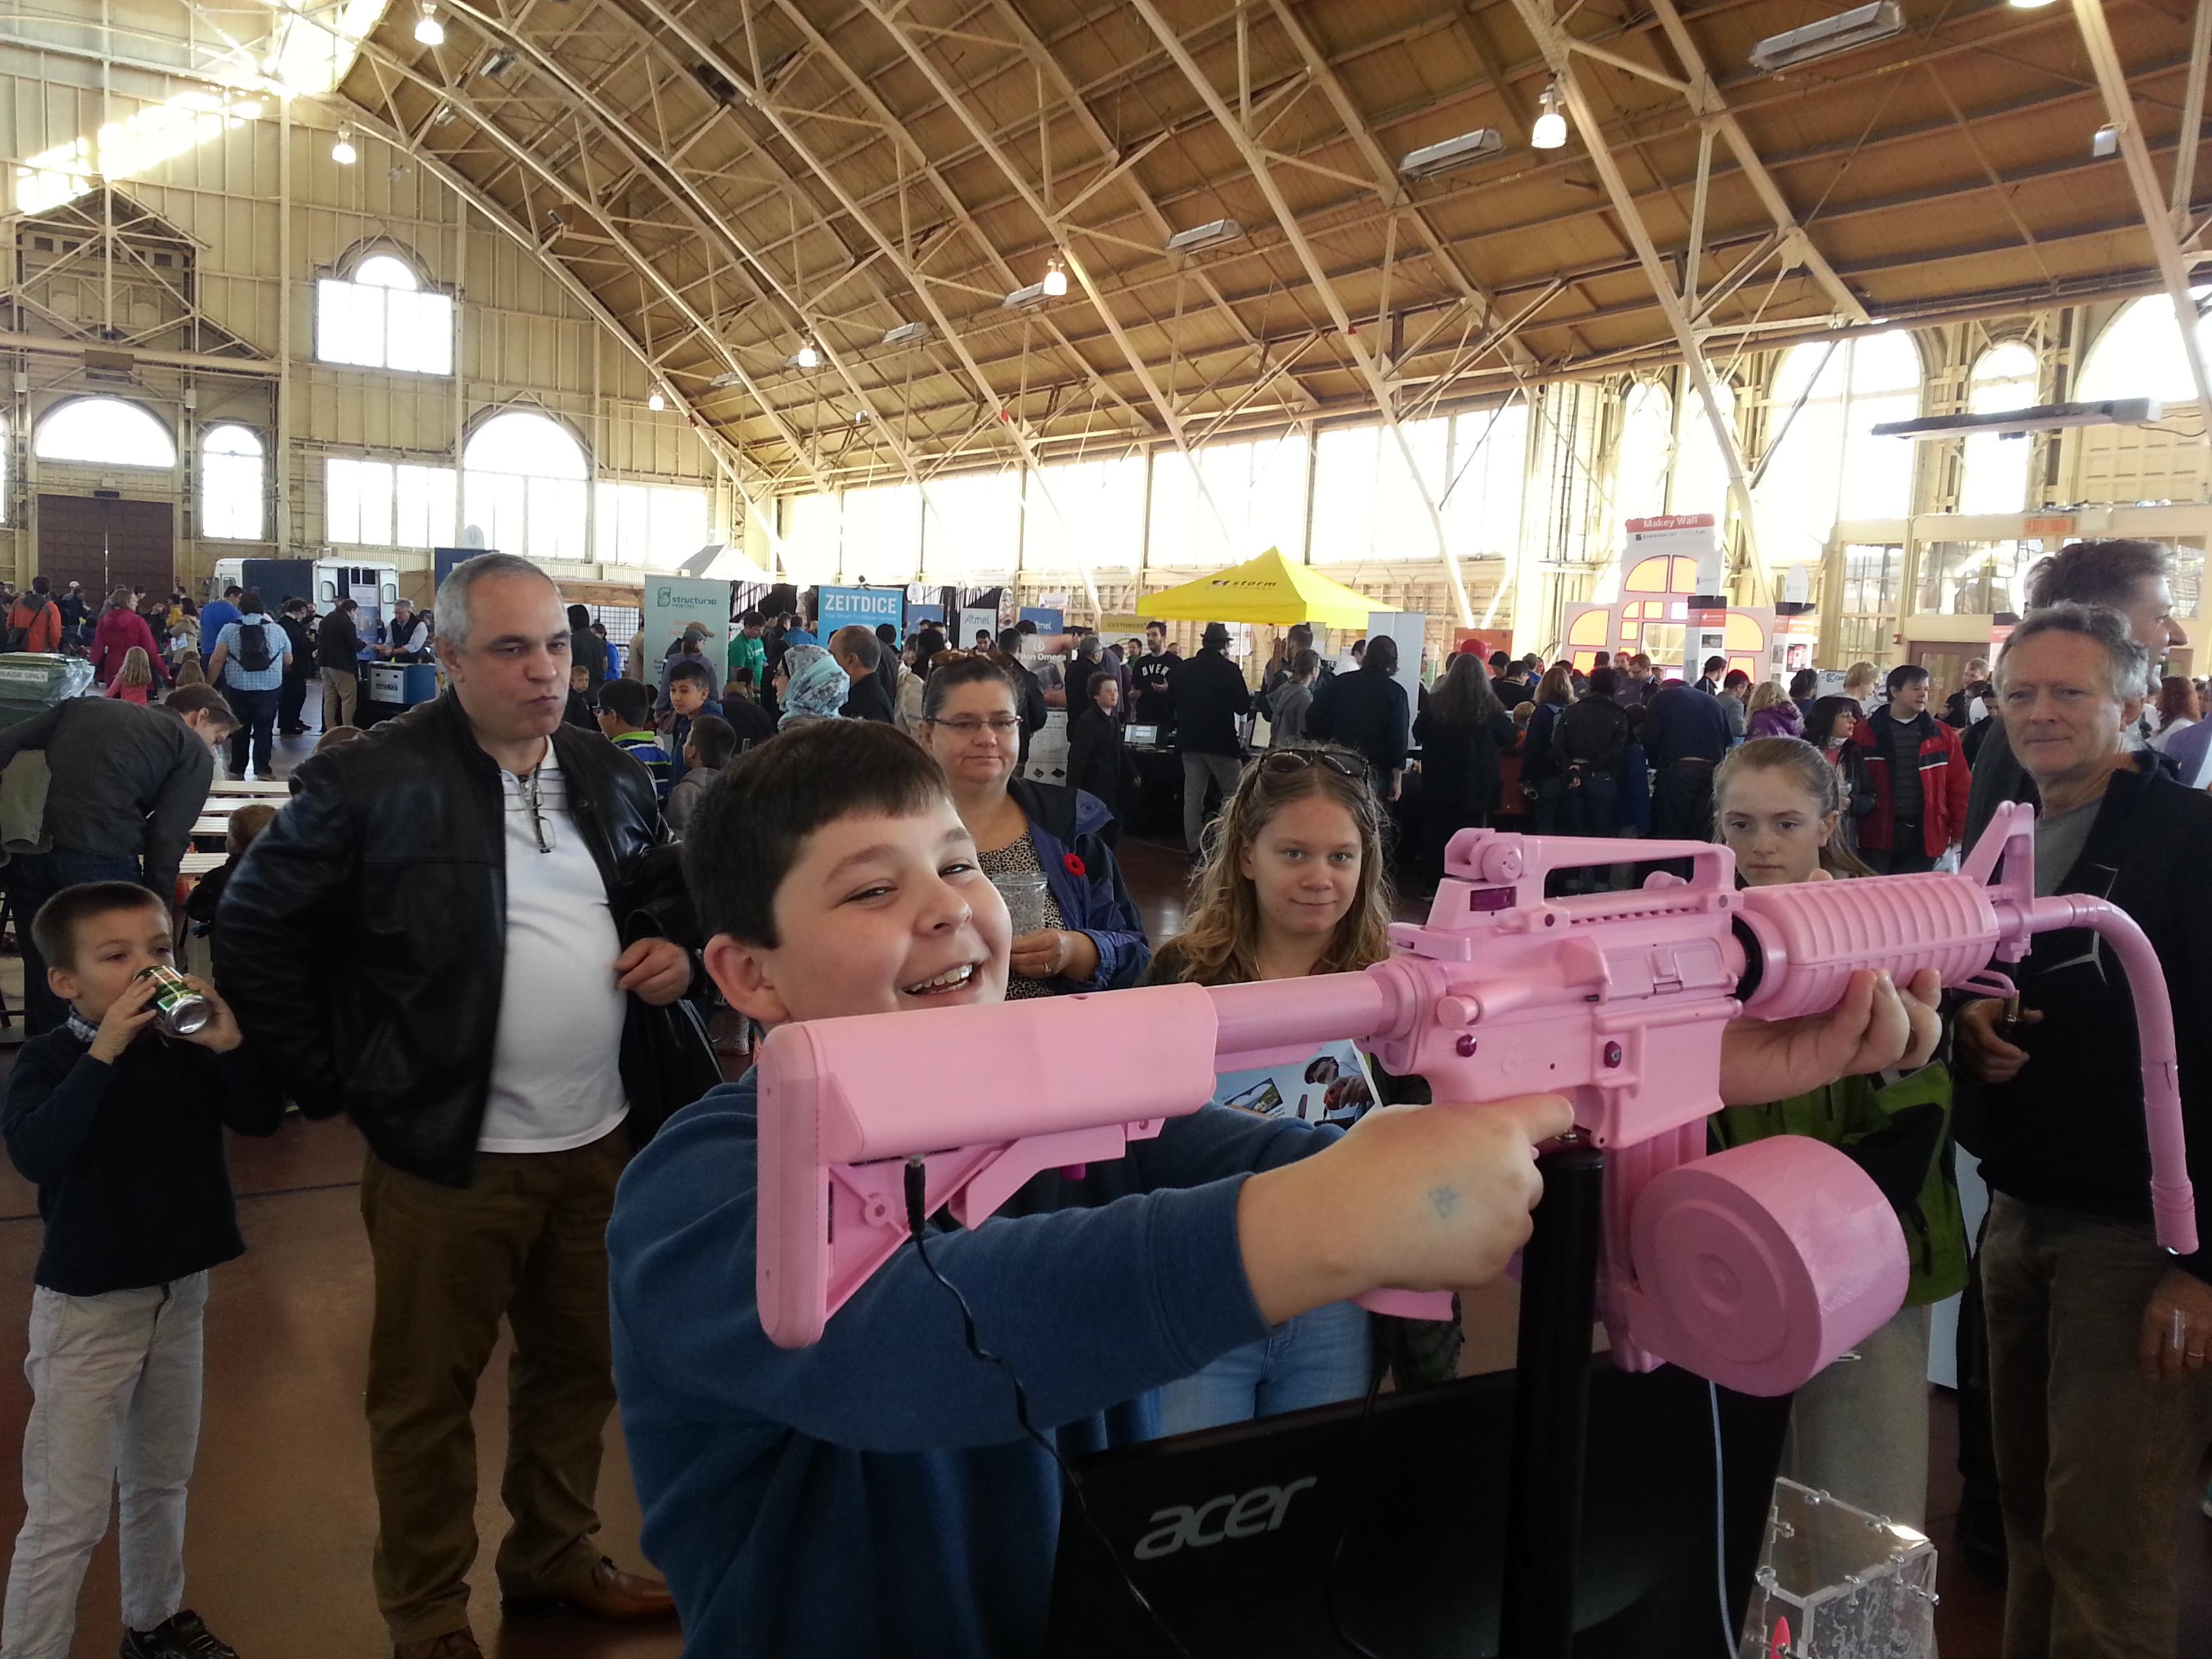 The Woman's Tears Machine Gun bullet holding Woman's tears pink gun